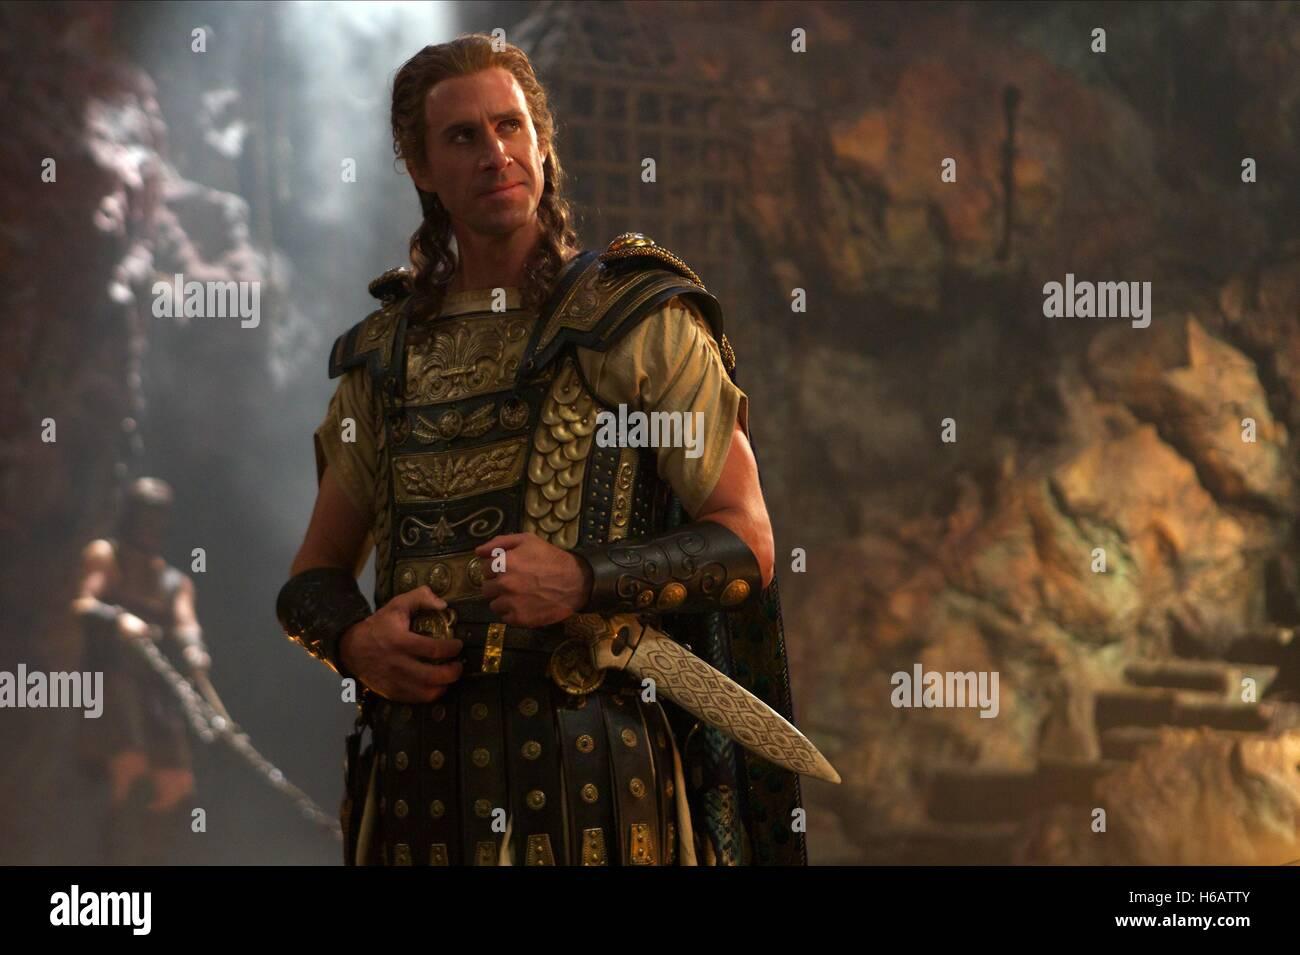 Joseph Fiennes Hercules 2014 Stock Photo Alamy